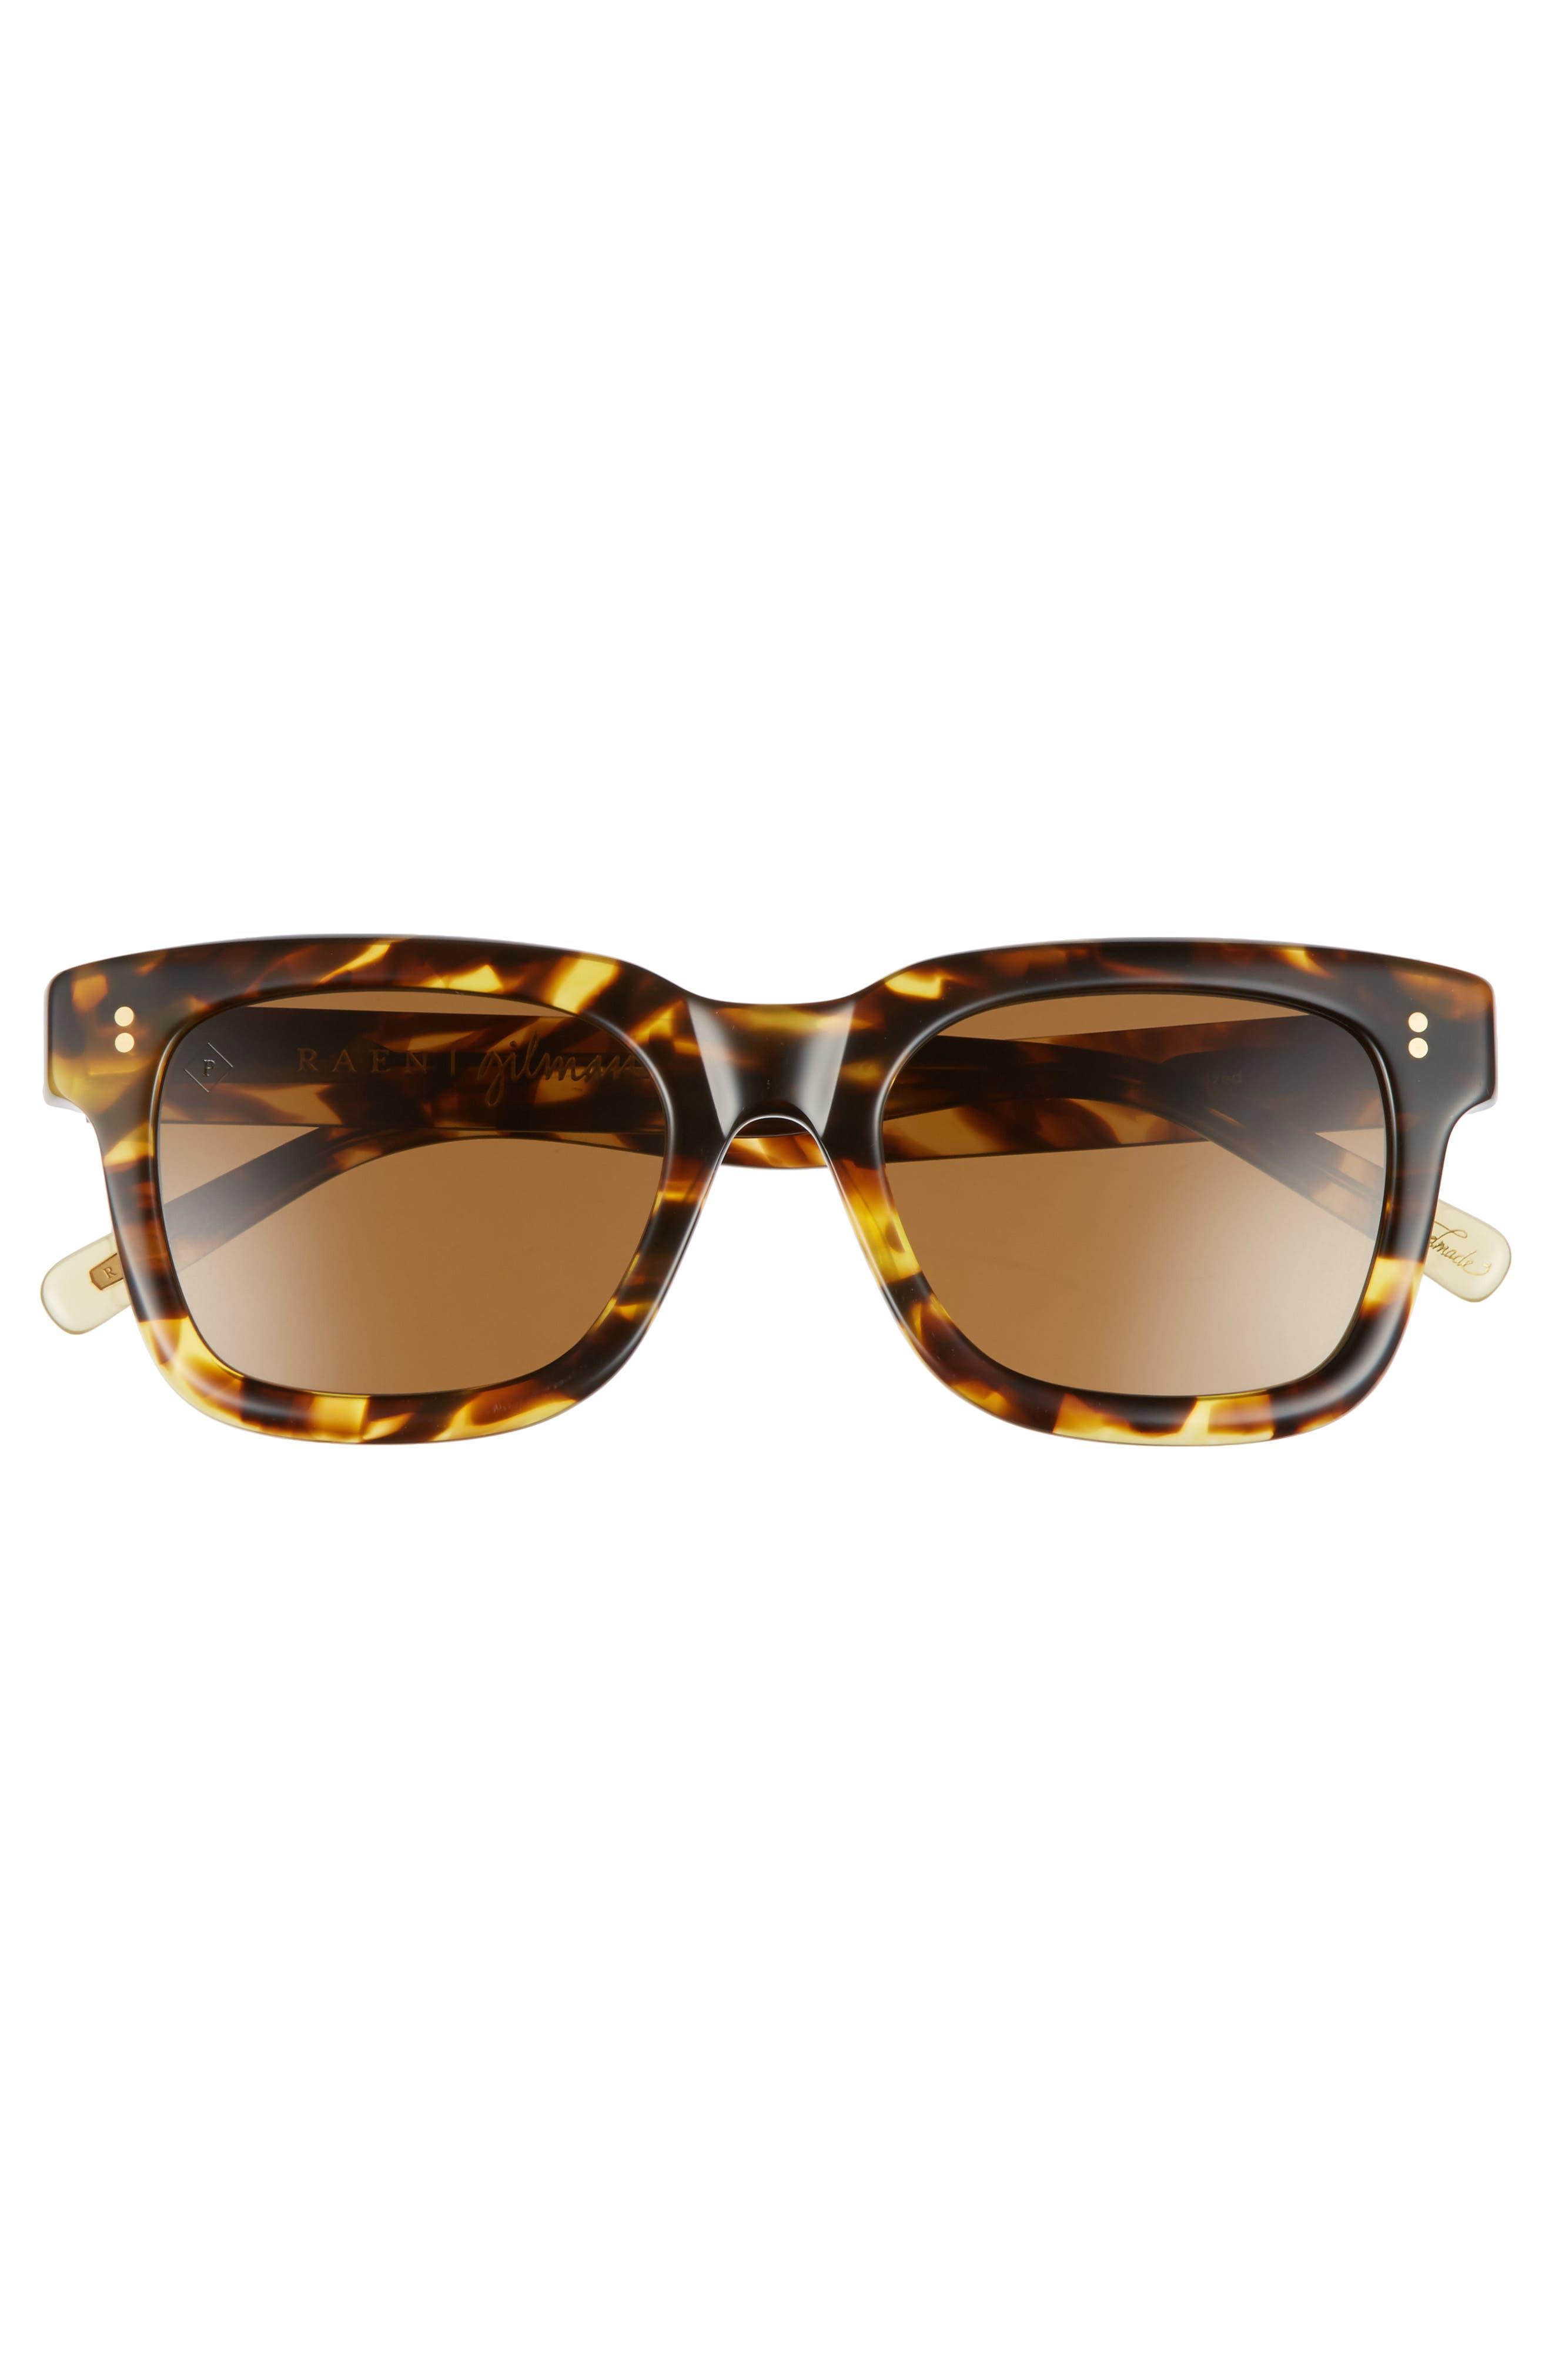 Gilman 52mm Polarized Sunglasses,                             Alternate thumbnail 2, color,                             TOKYO TORTOISE/ BROWN